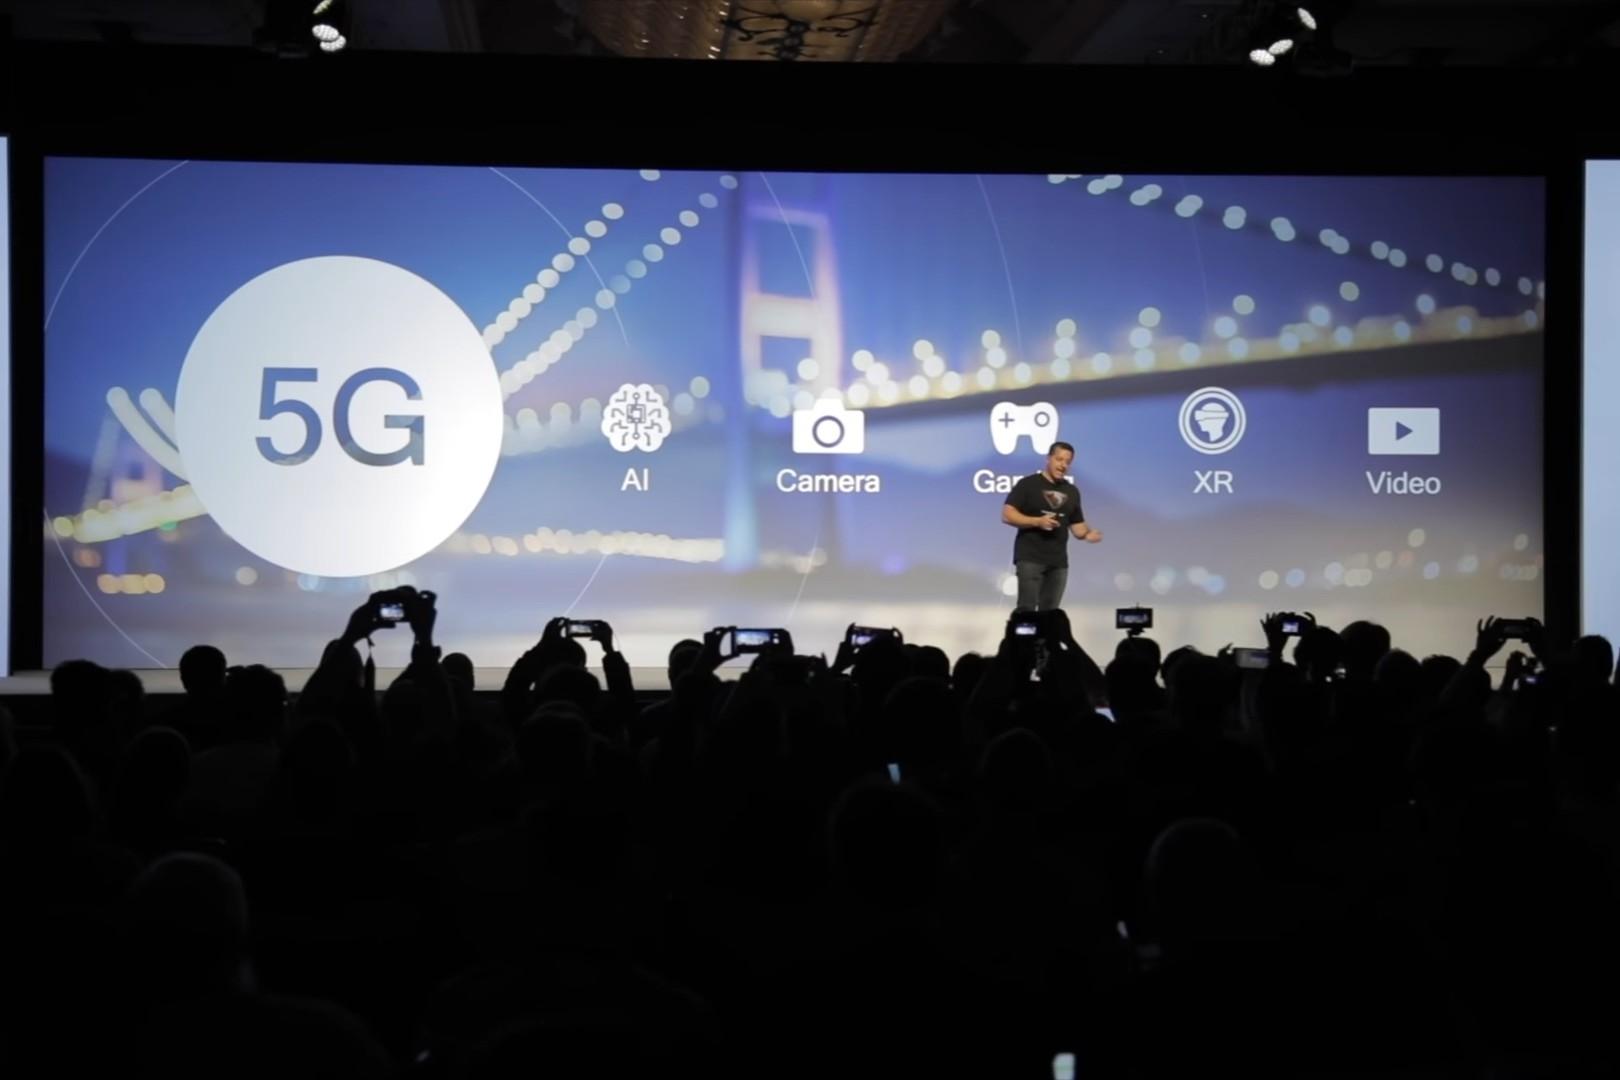 Snapdragon 5G